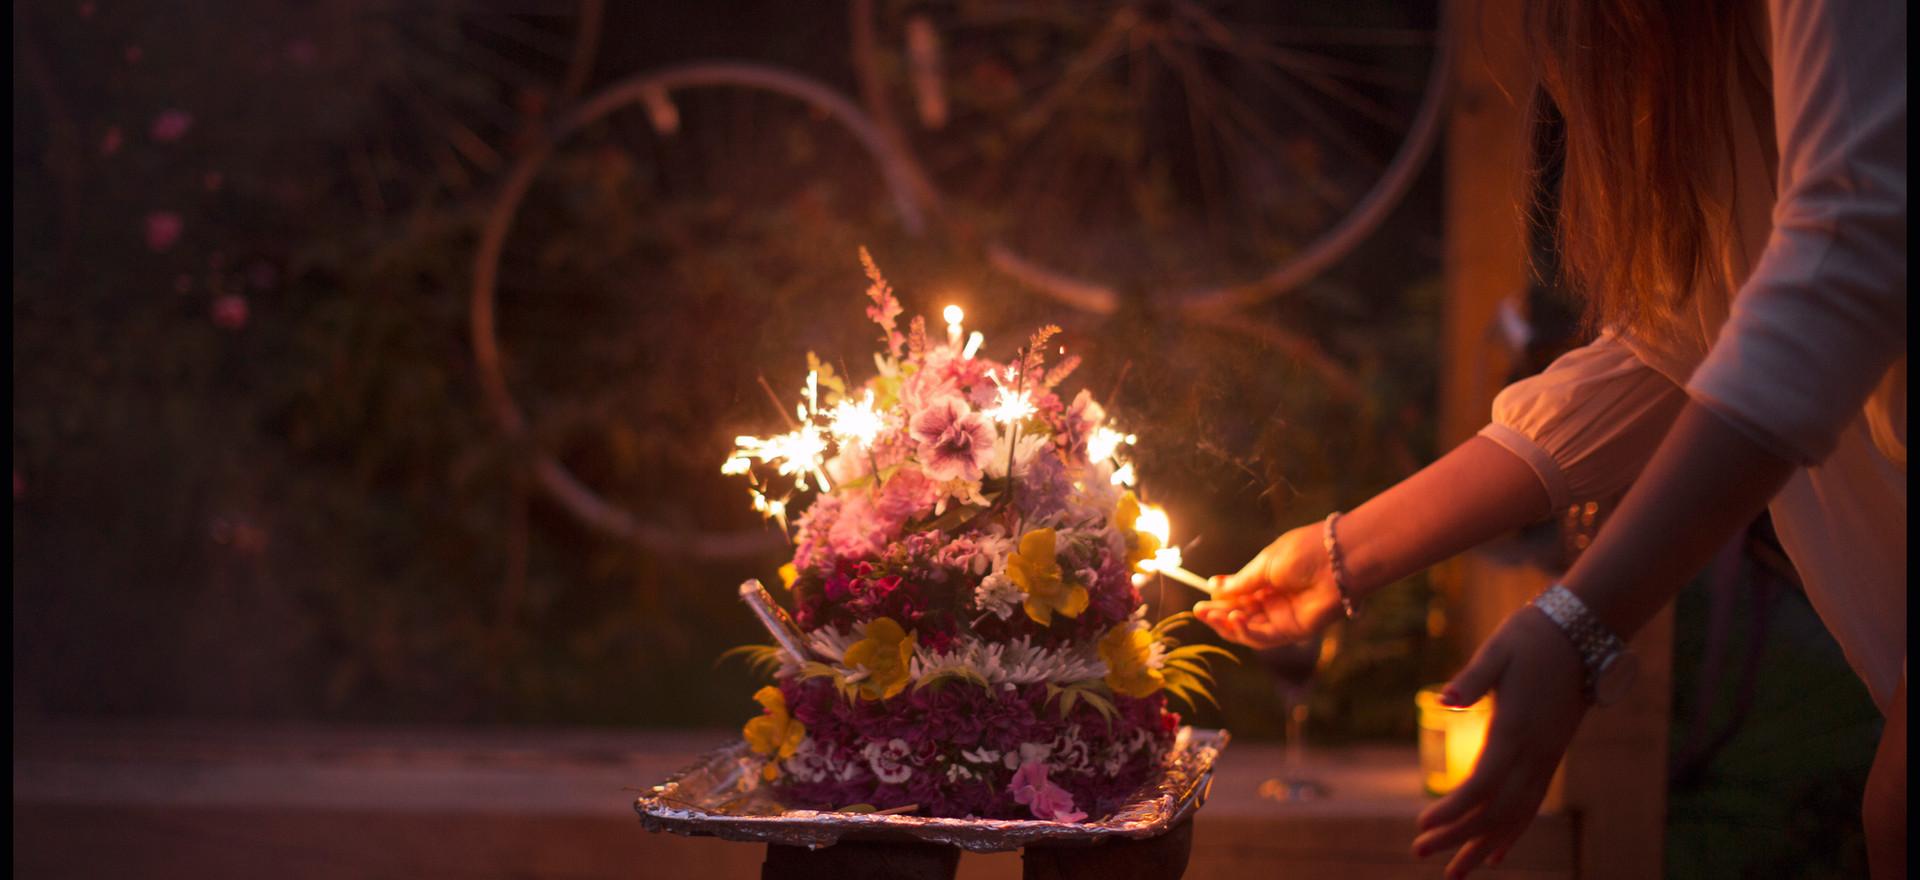 Fiori & Candle   club nautico chia